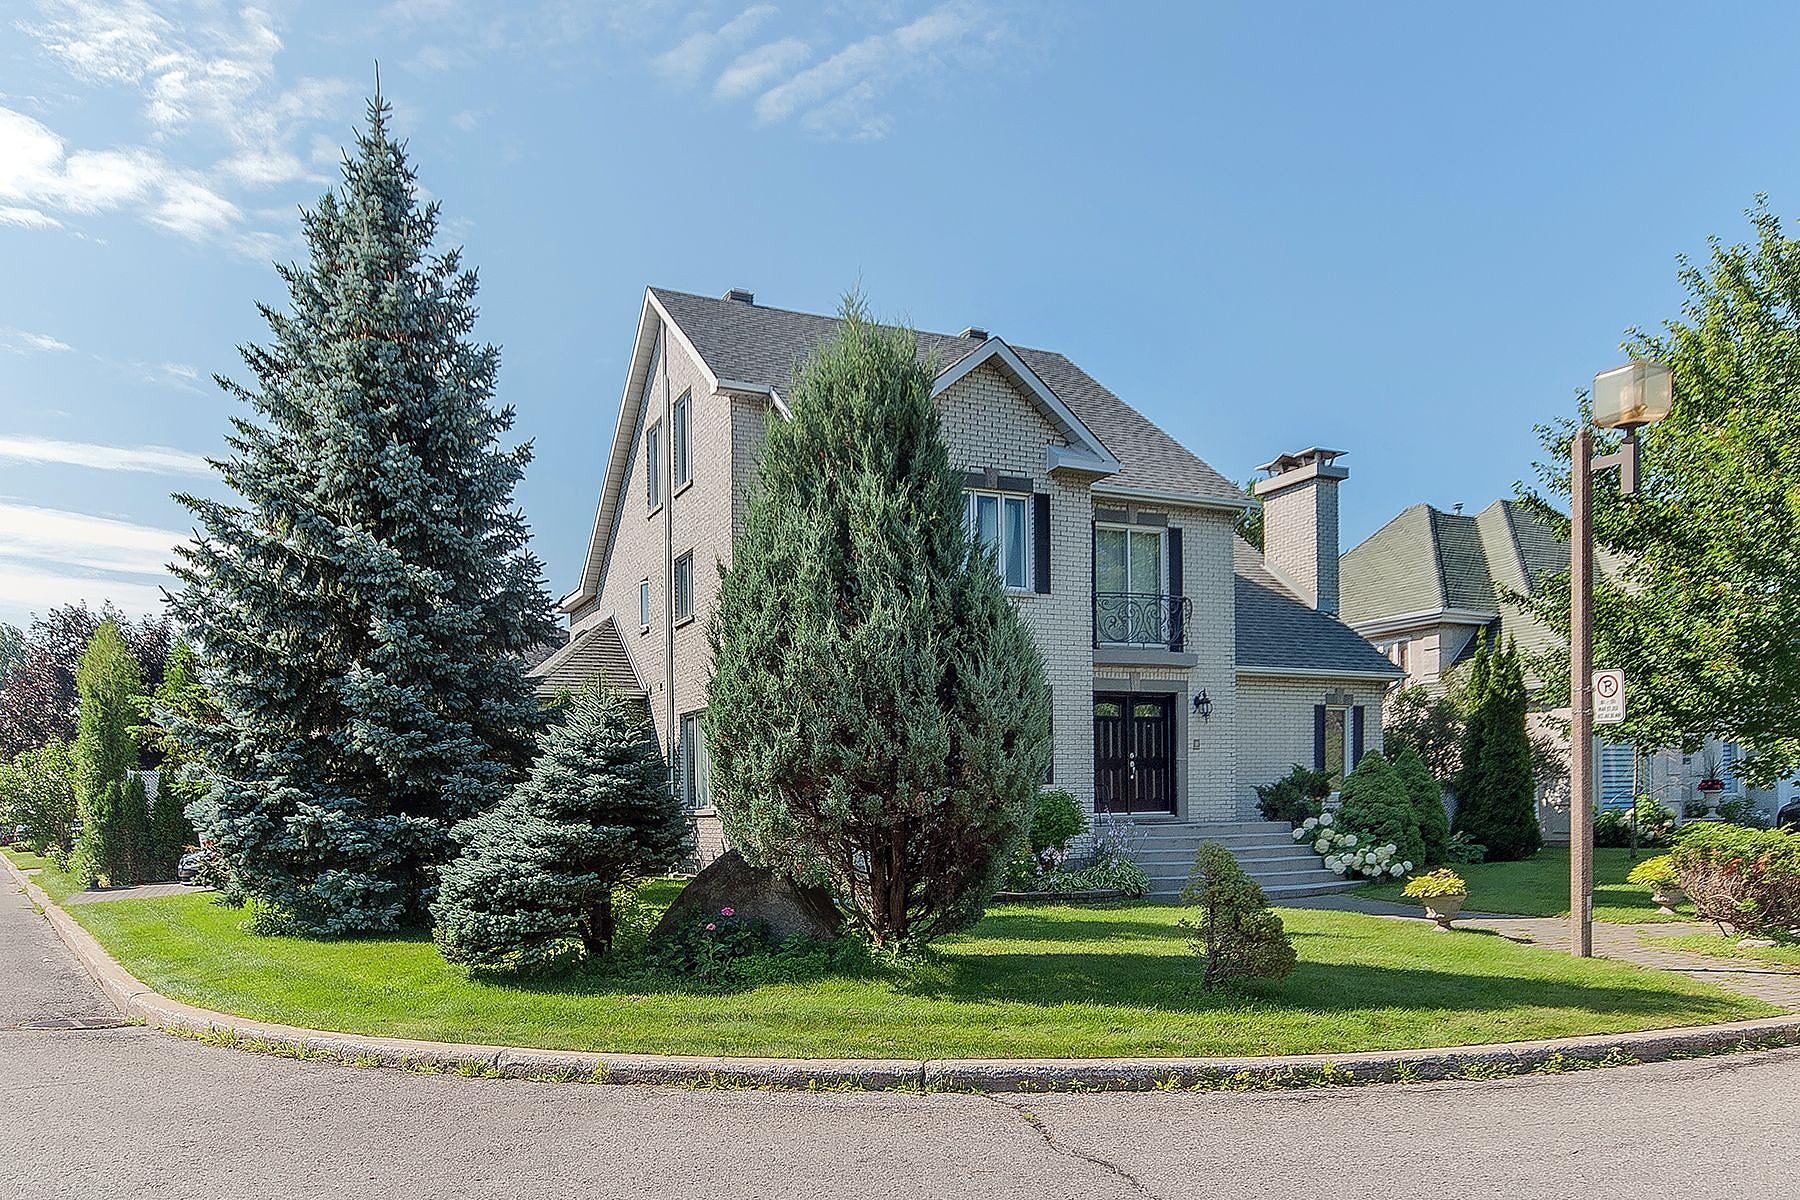 Single Family Home for Sale at Sainte-Dorothée, Laval 236 Rue Lacoste Sainte-Dorothee, Quebec, H7X3K2 Canada